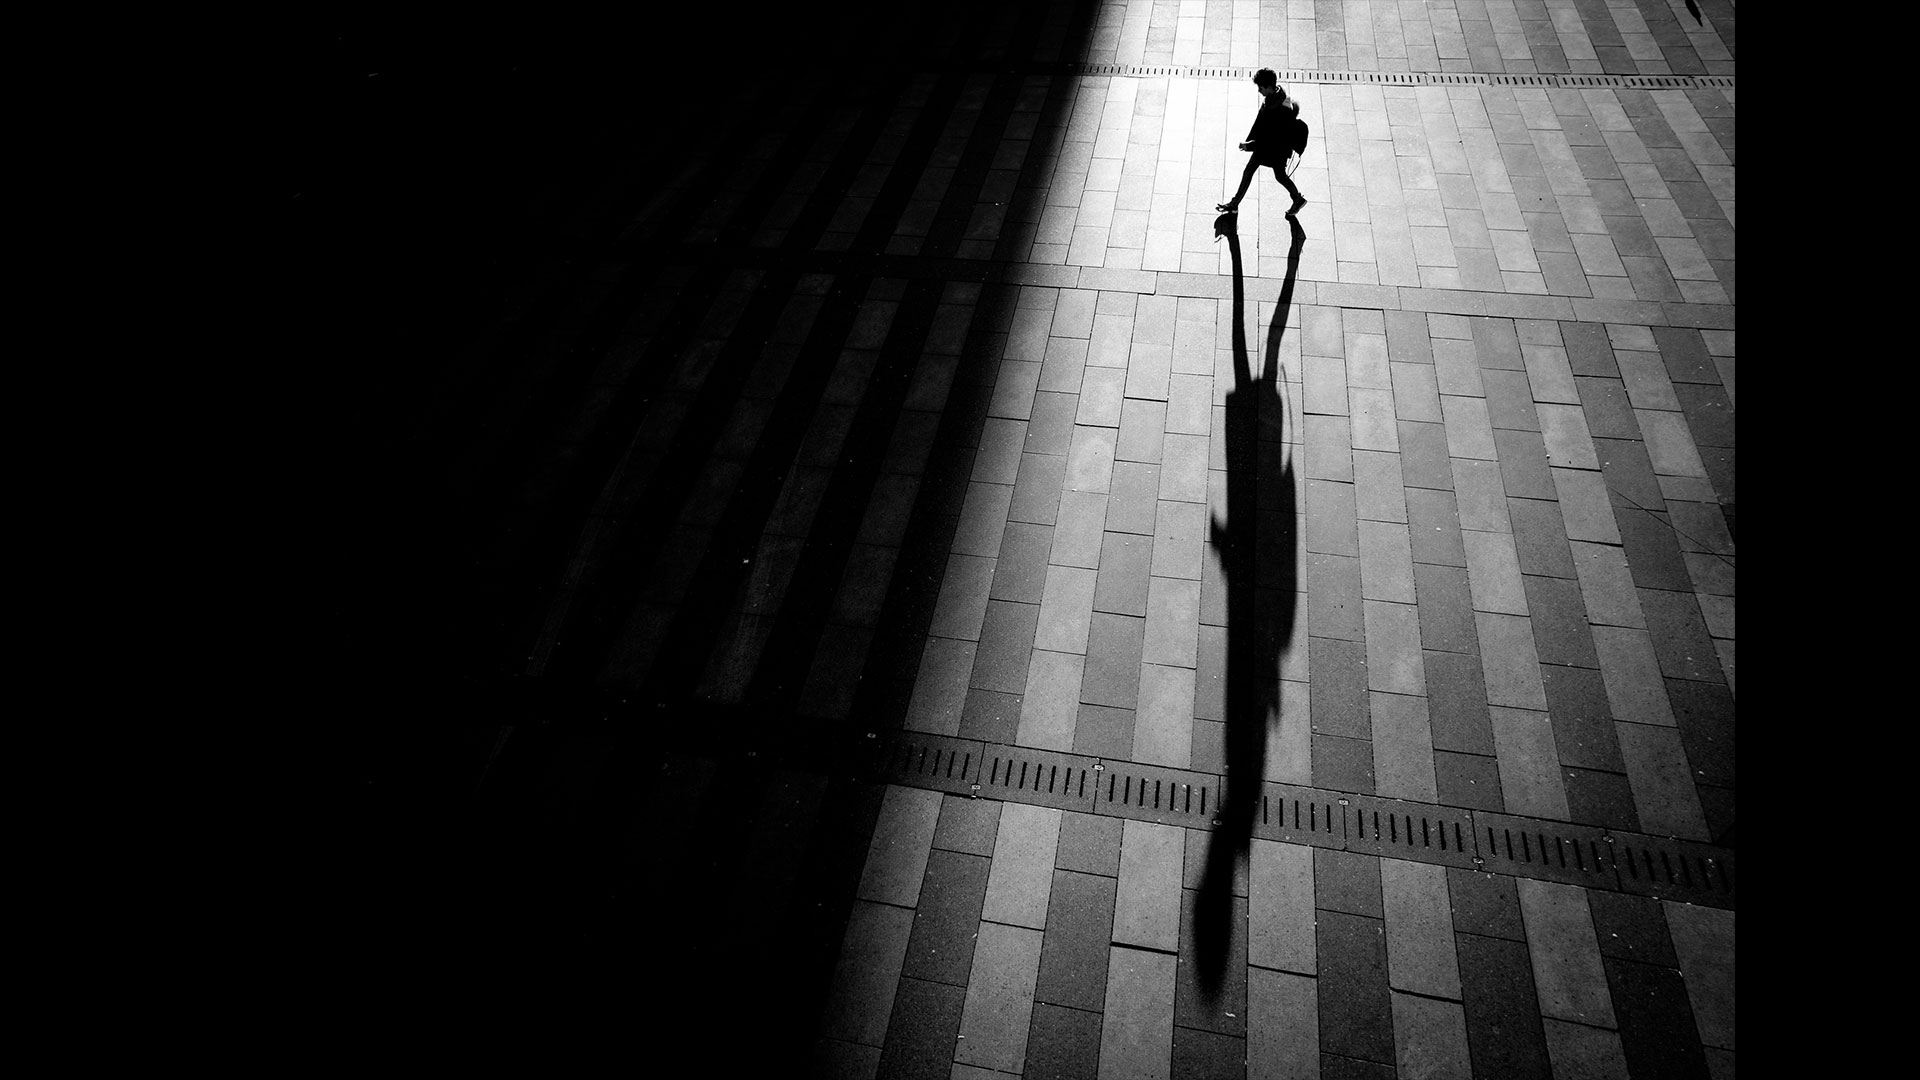 Photographer: Michael Berg Curator: Lauri Novak